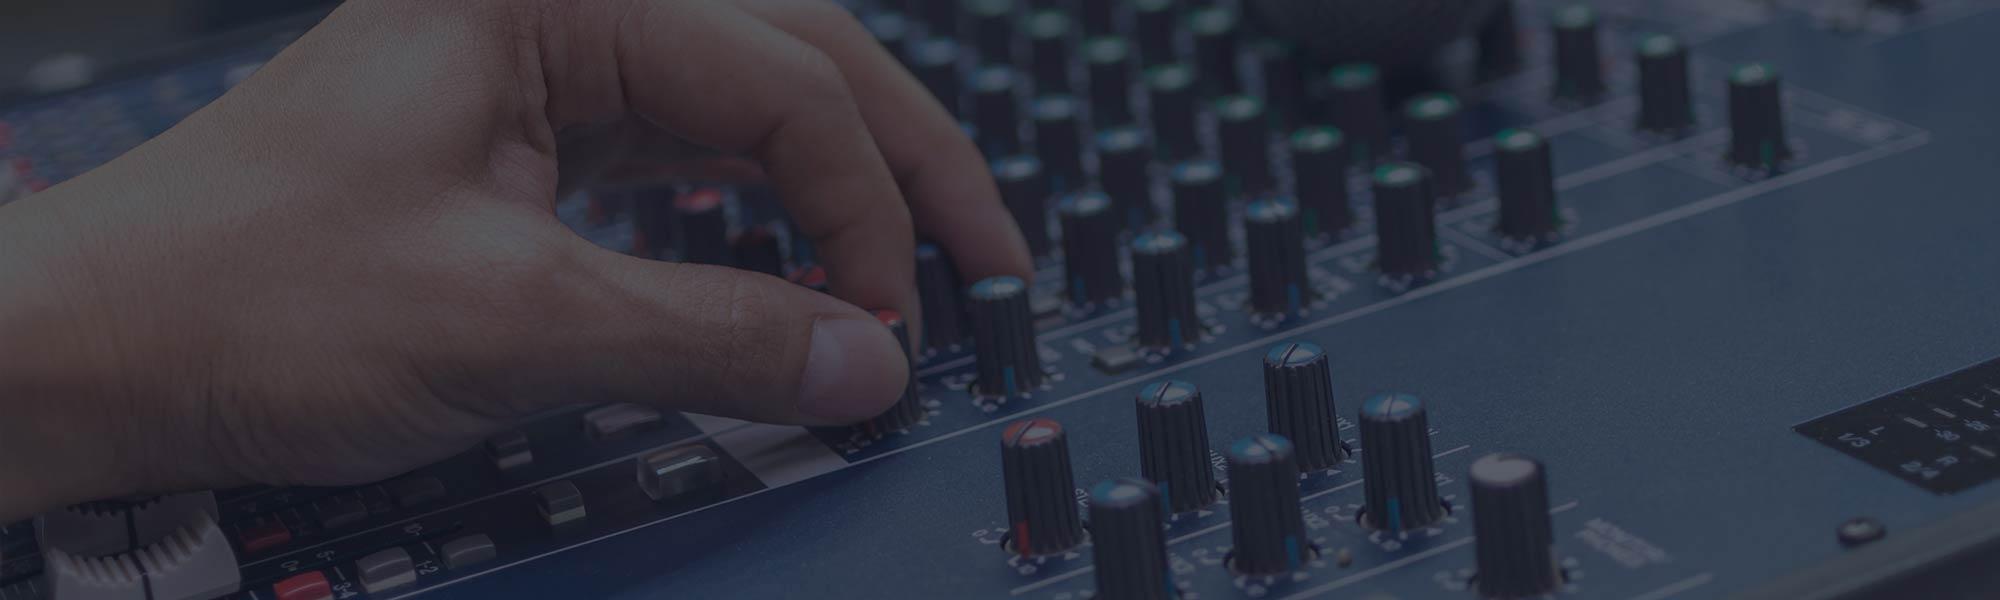 course_music_portfolio_header